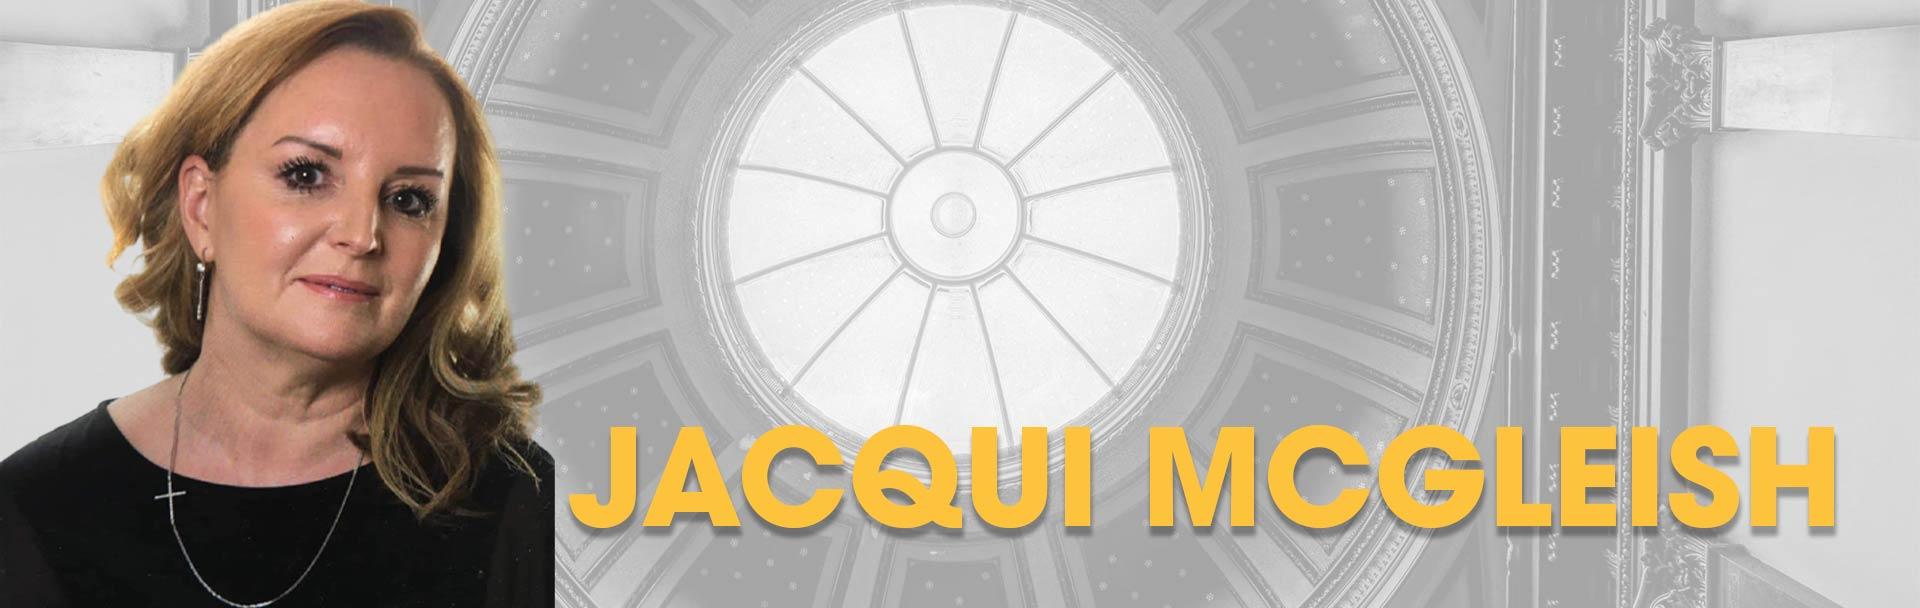 Jacqui McGleish is part of Saturday Night Demonstrations of Mediumship at the Sir Arthur Conan Doyle Centre